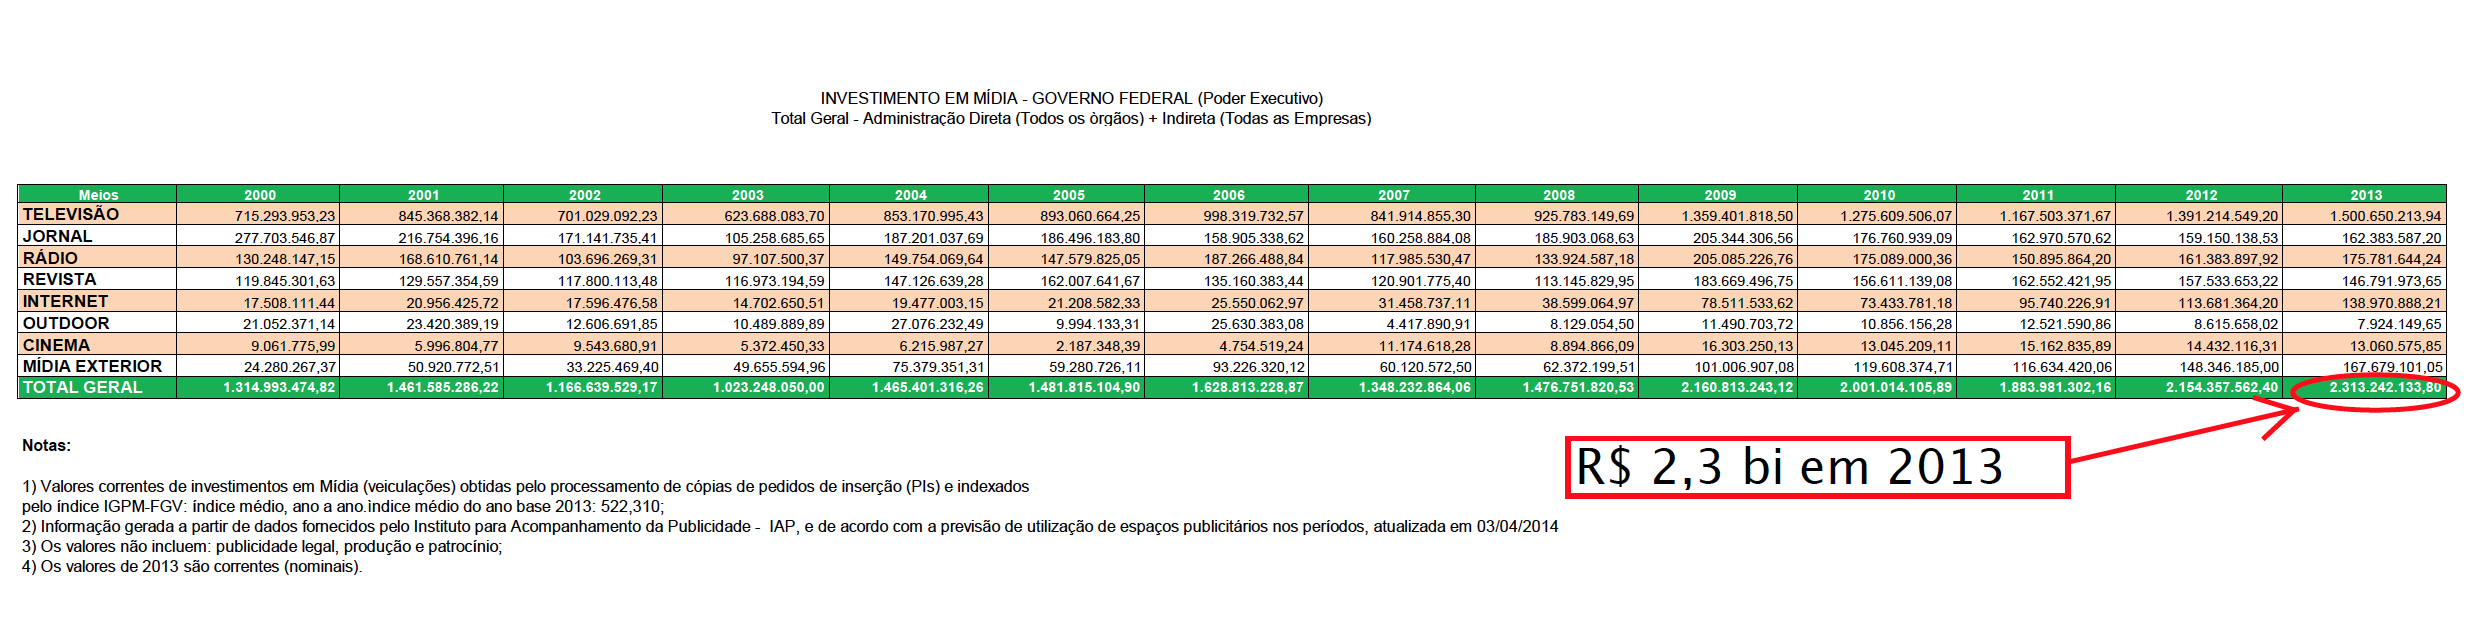 Publicidade-2013-total-administracao-direta-todos-os-orgaos-indirera-todas-as-empresas-b